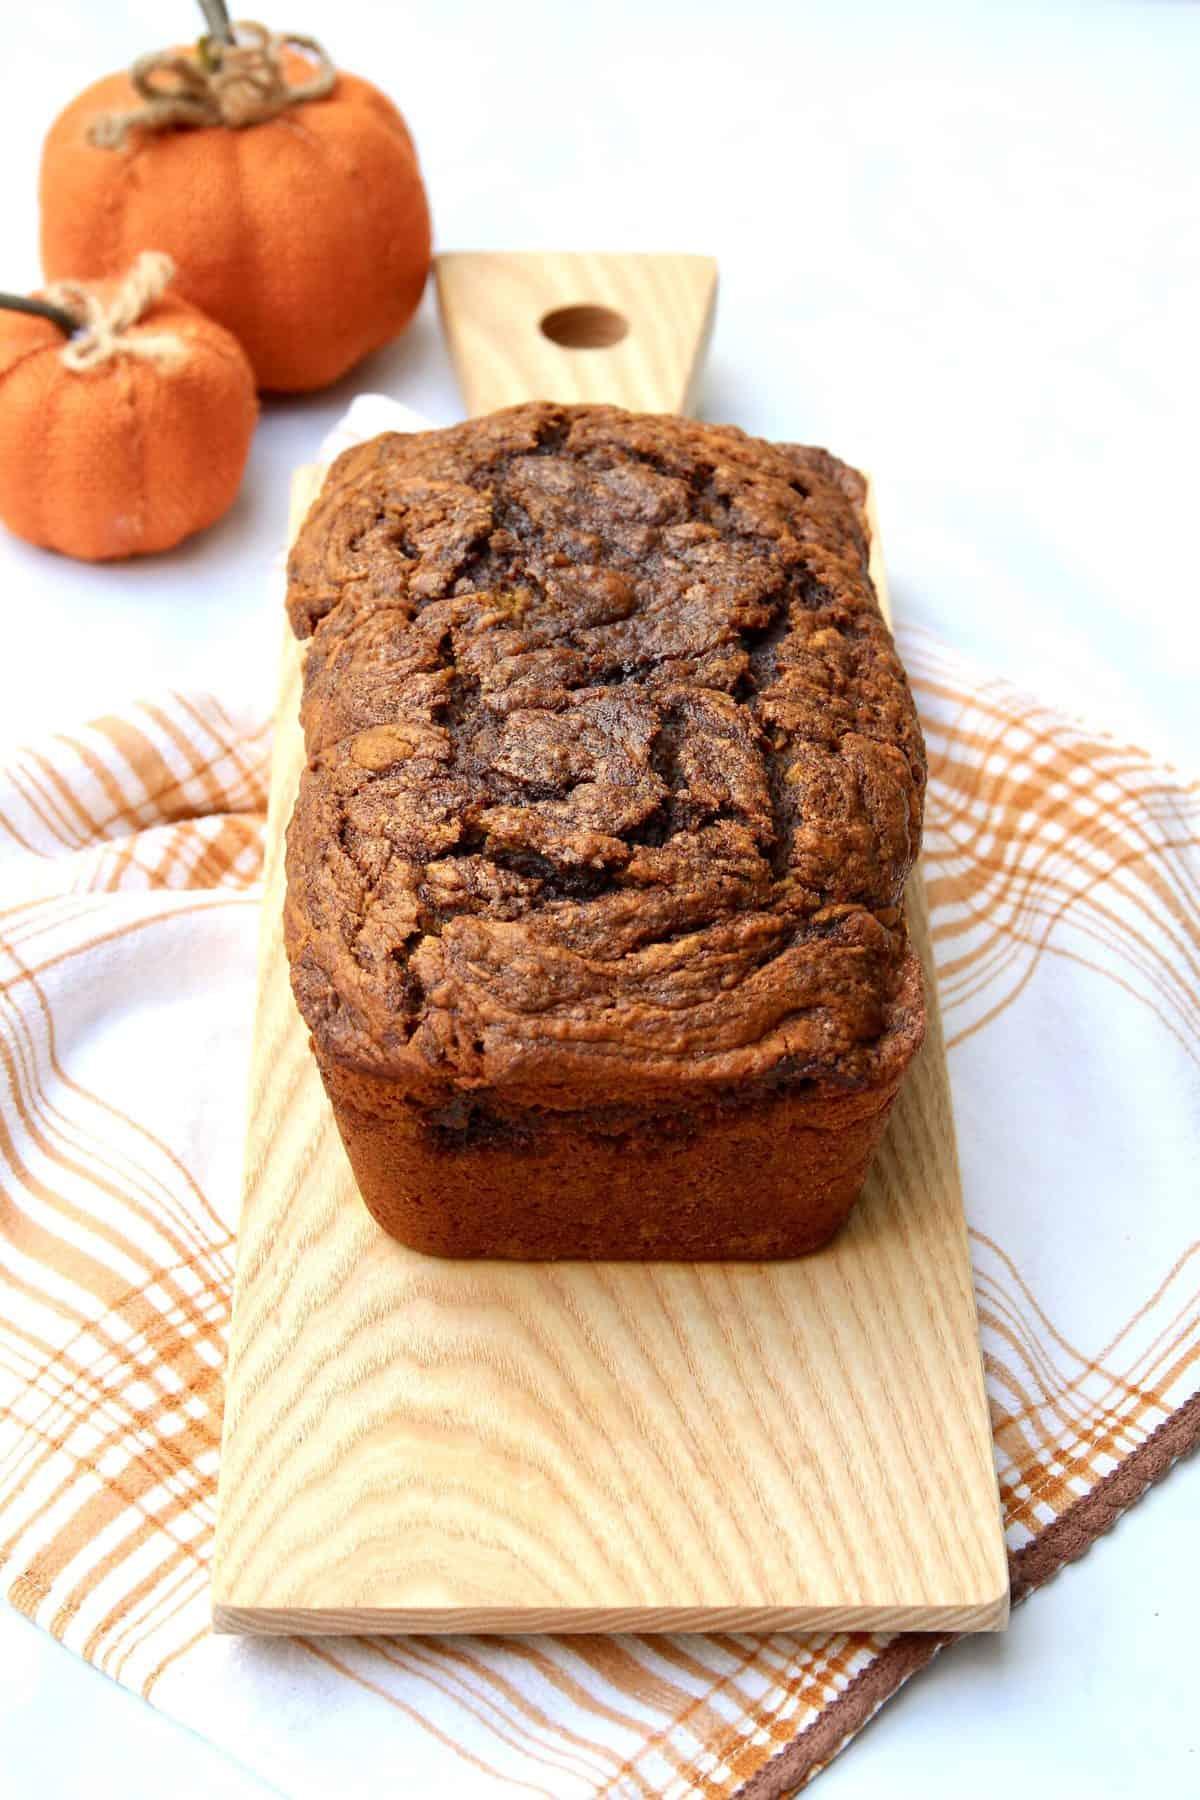 Cinnamon Swirled Pumpkin Bread